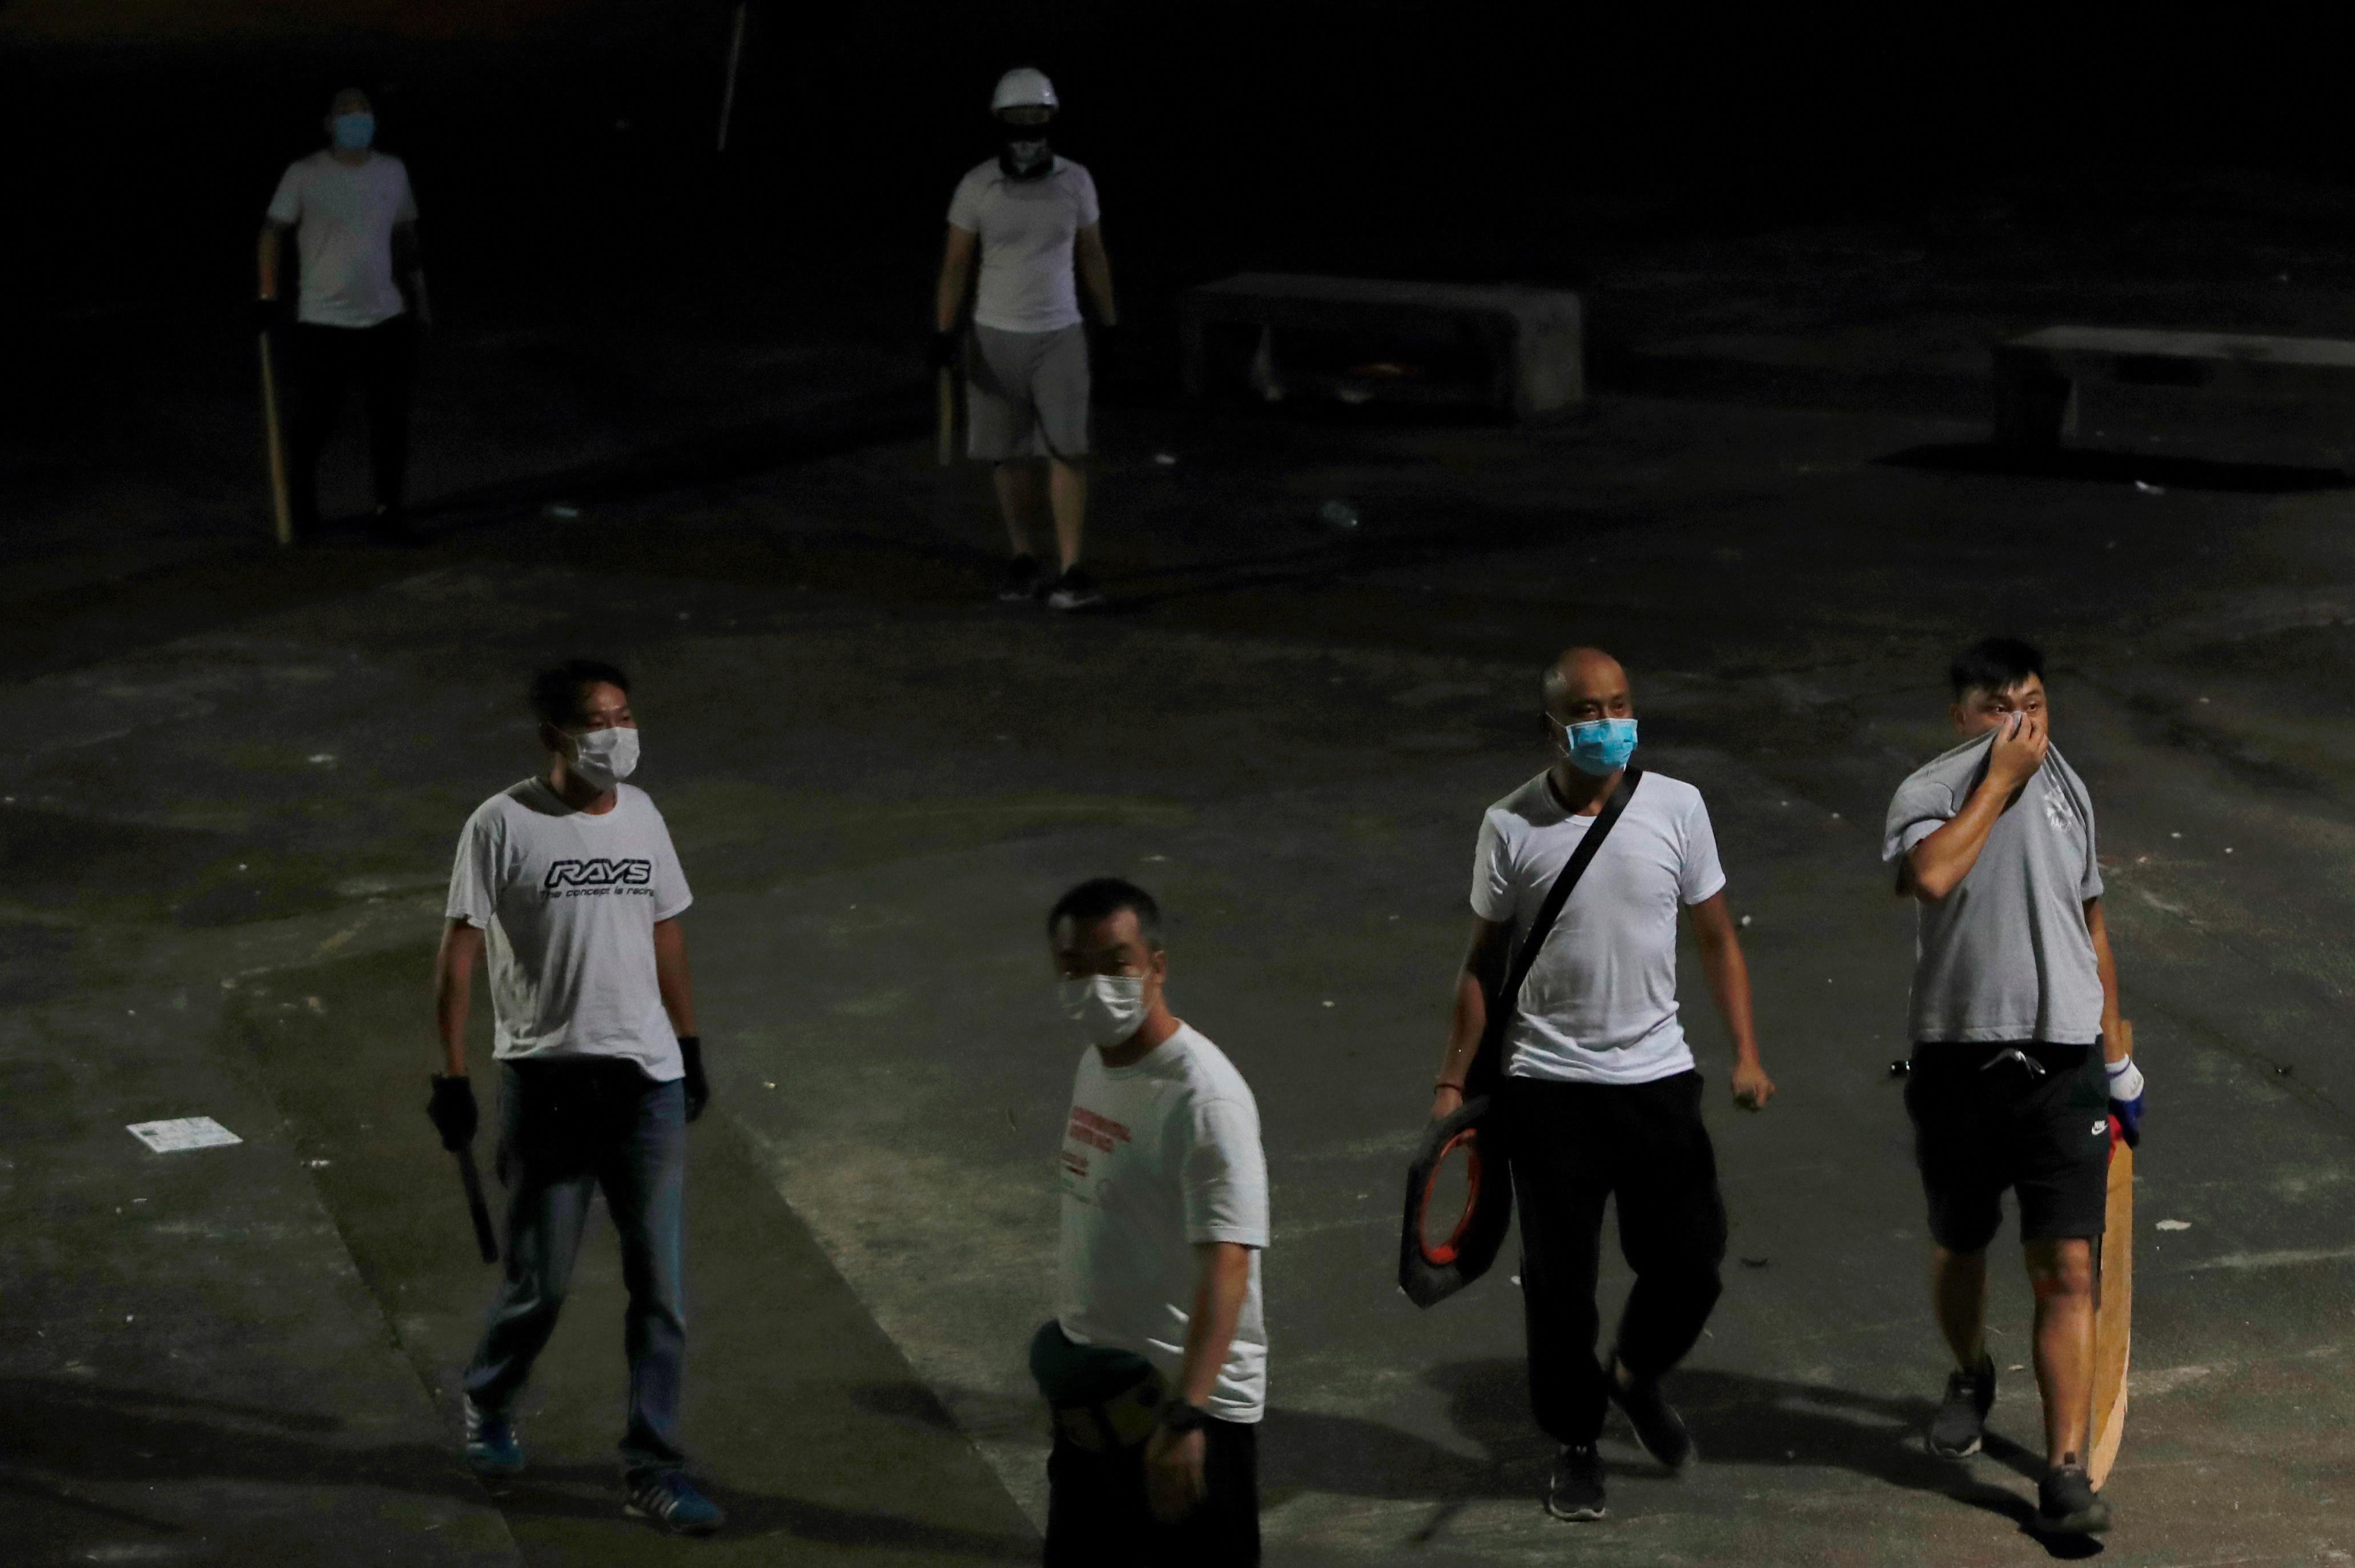 Hong Kong Protests Turn Violent As Clashes Erupt Between Demonstrators And Masked Mob